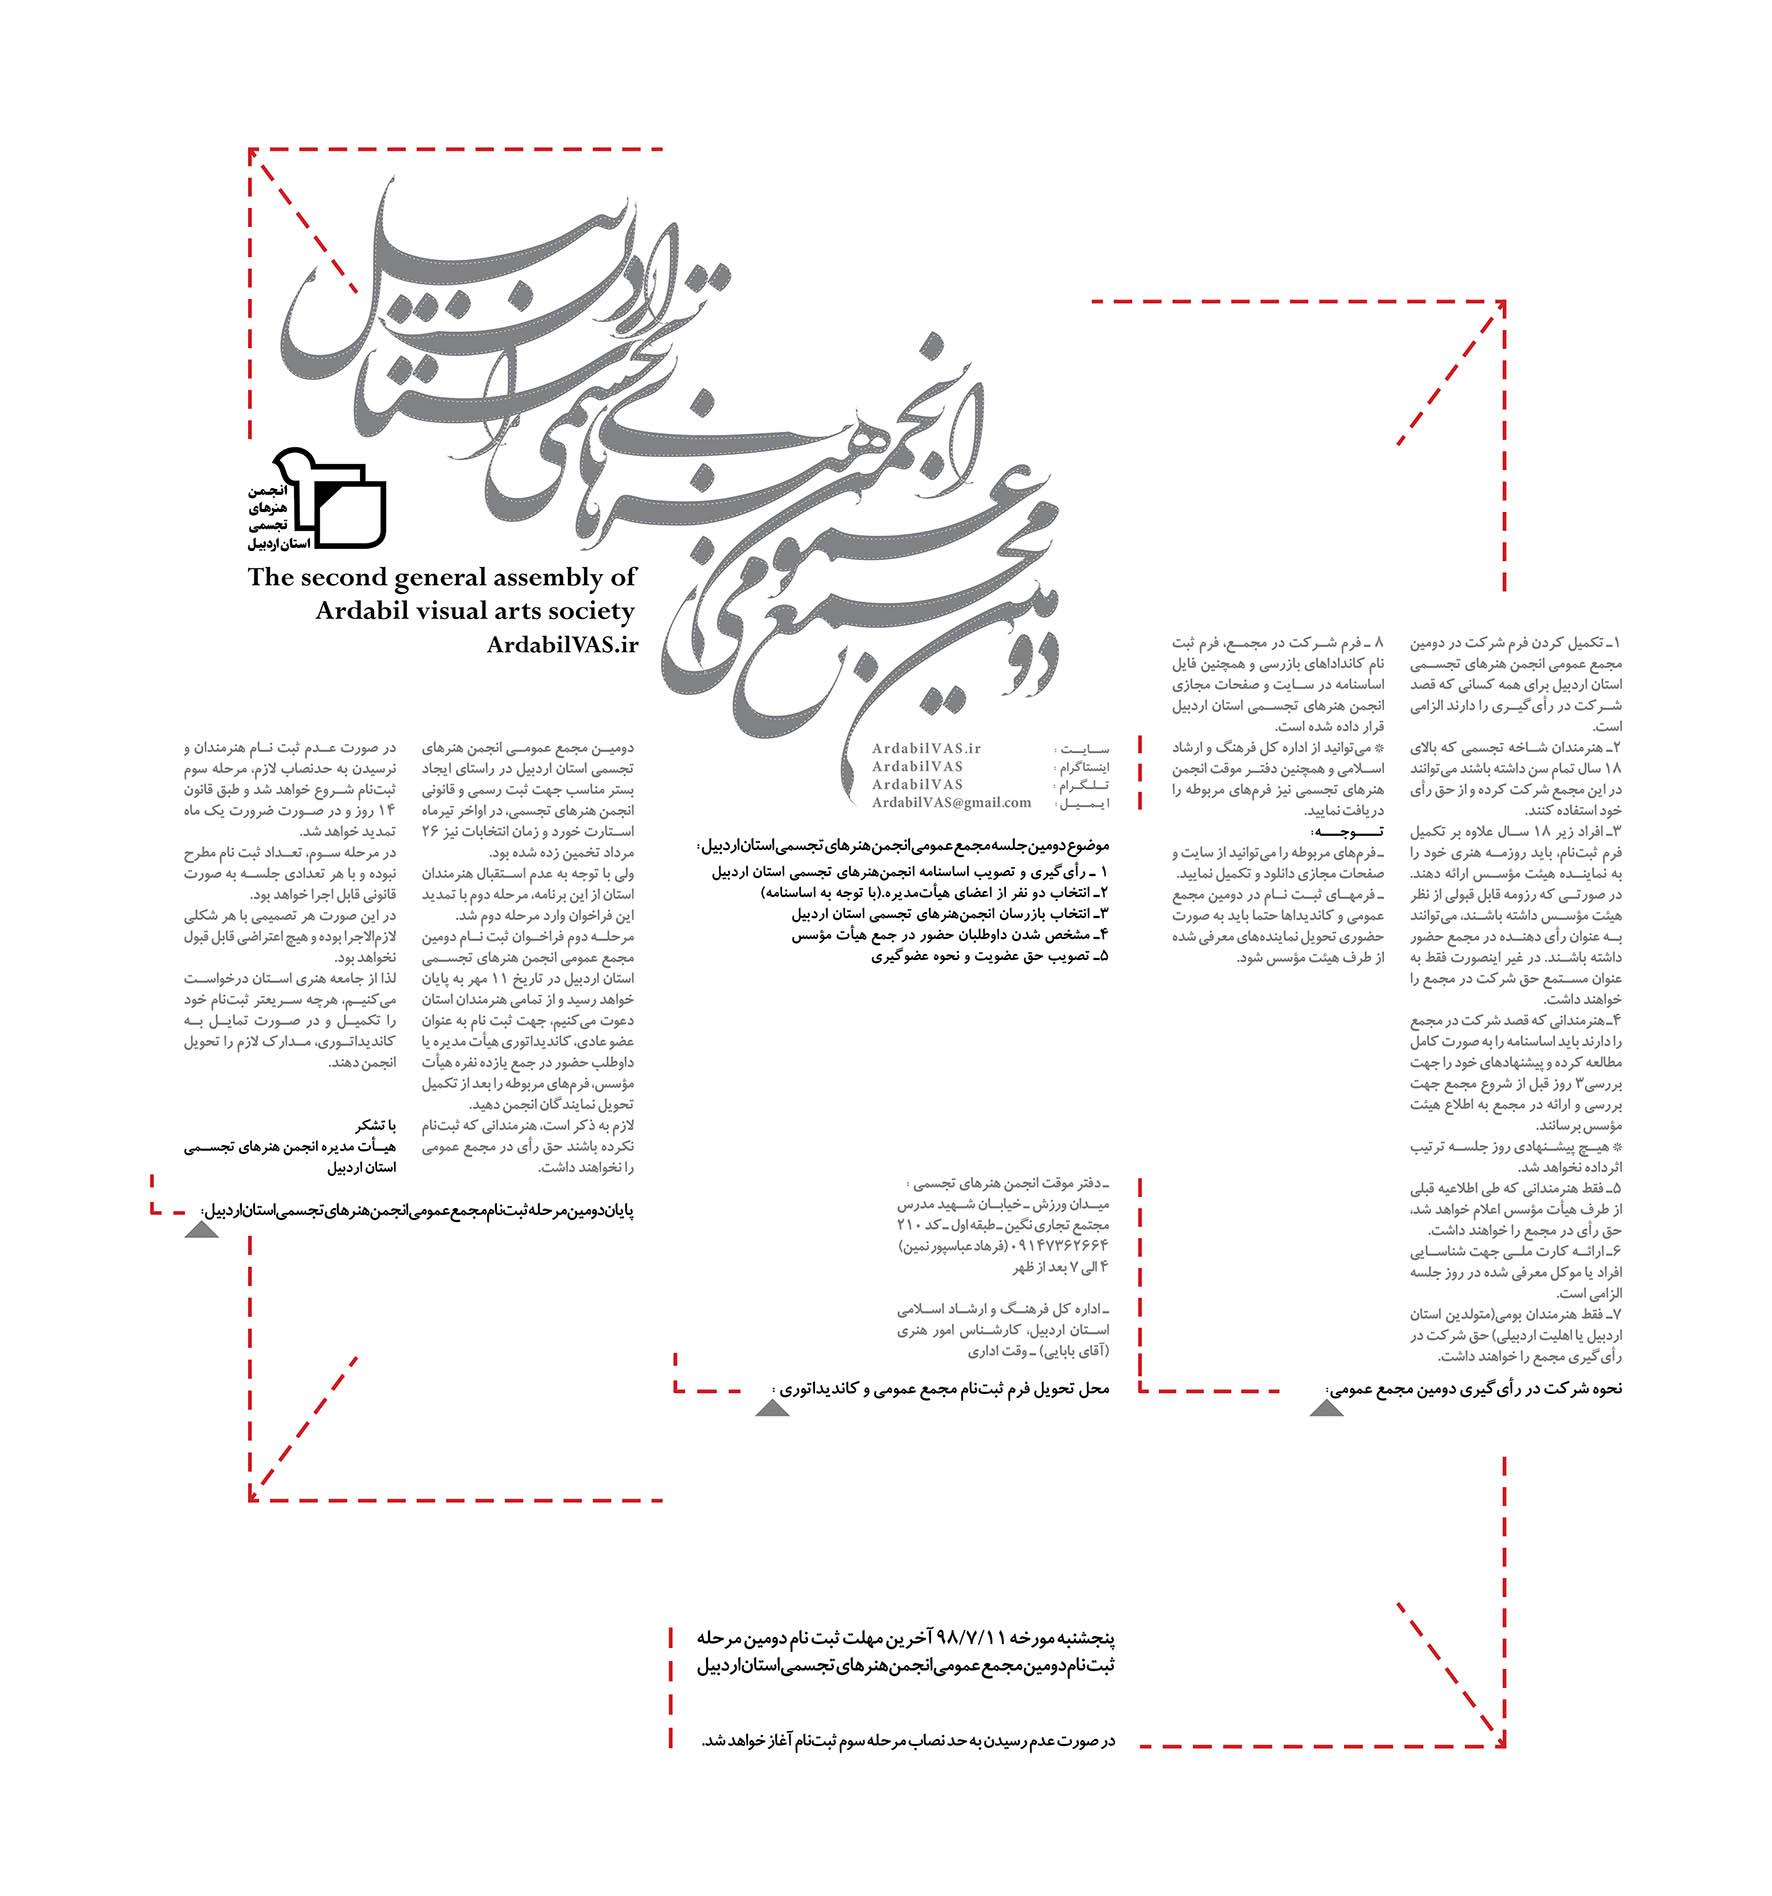 Photo of آخرین مهلت برای ثبتنام در دومین مجمع عمومی انجمن هنرهای تجسمی استان اردبیل